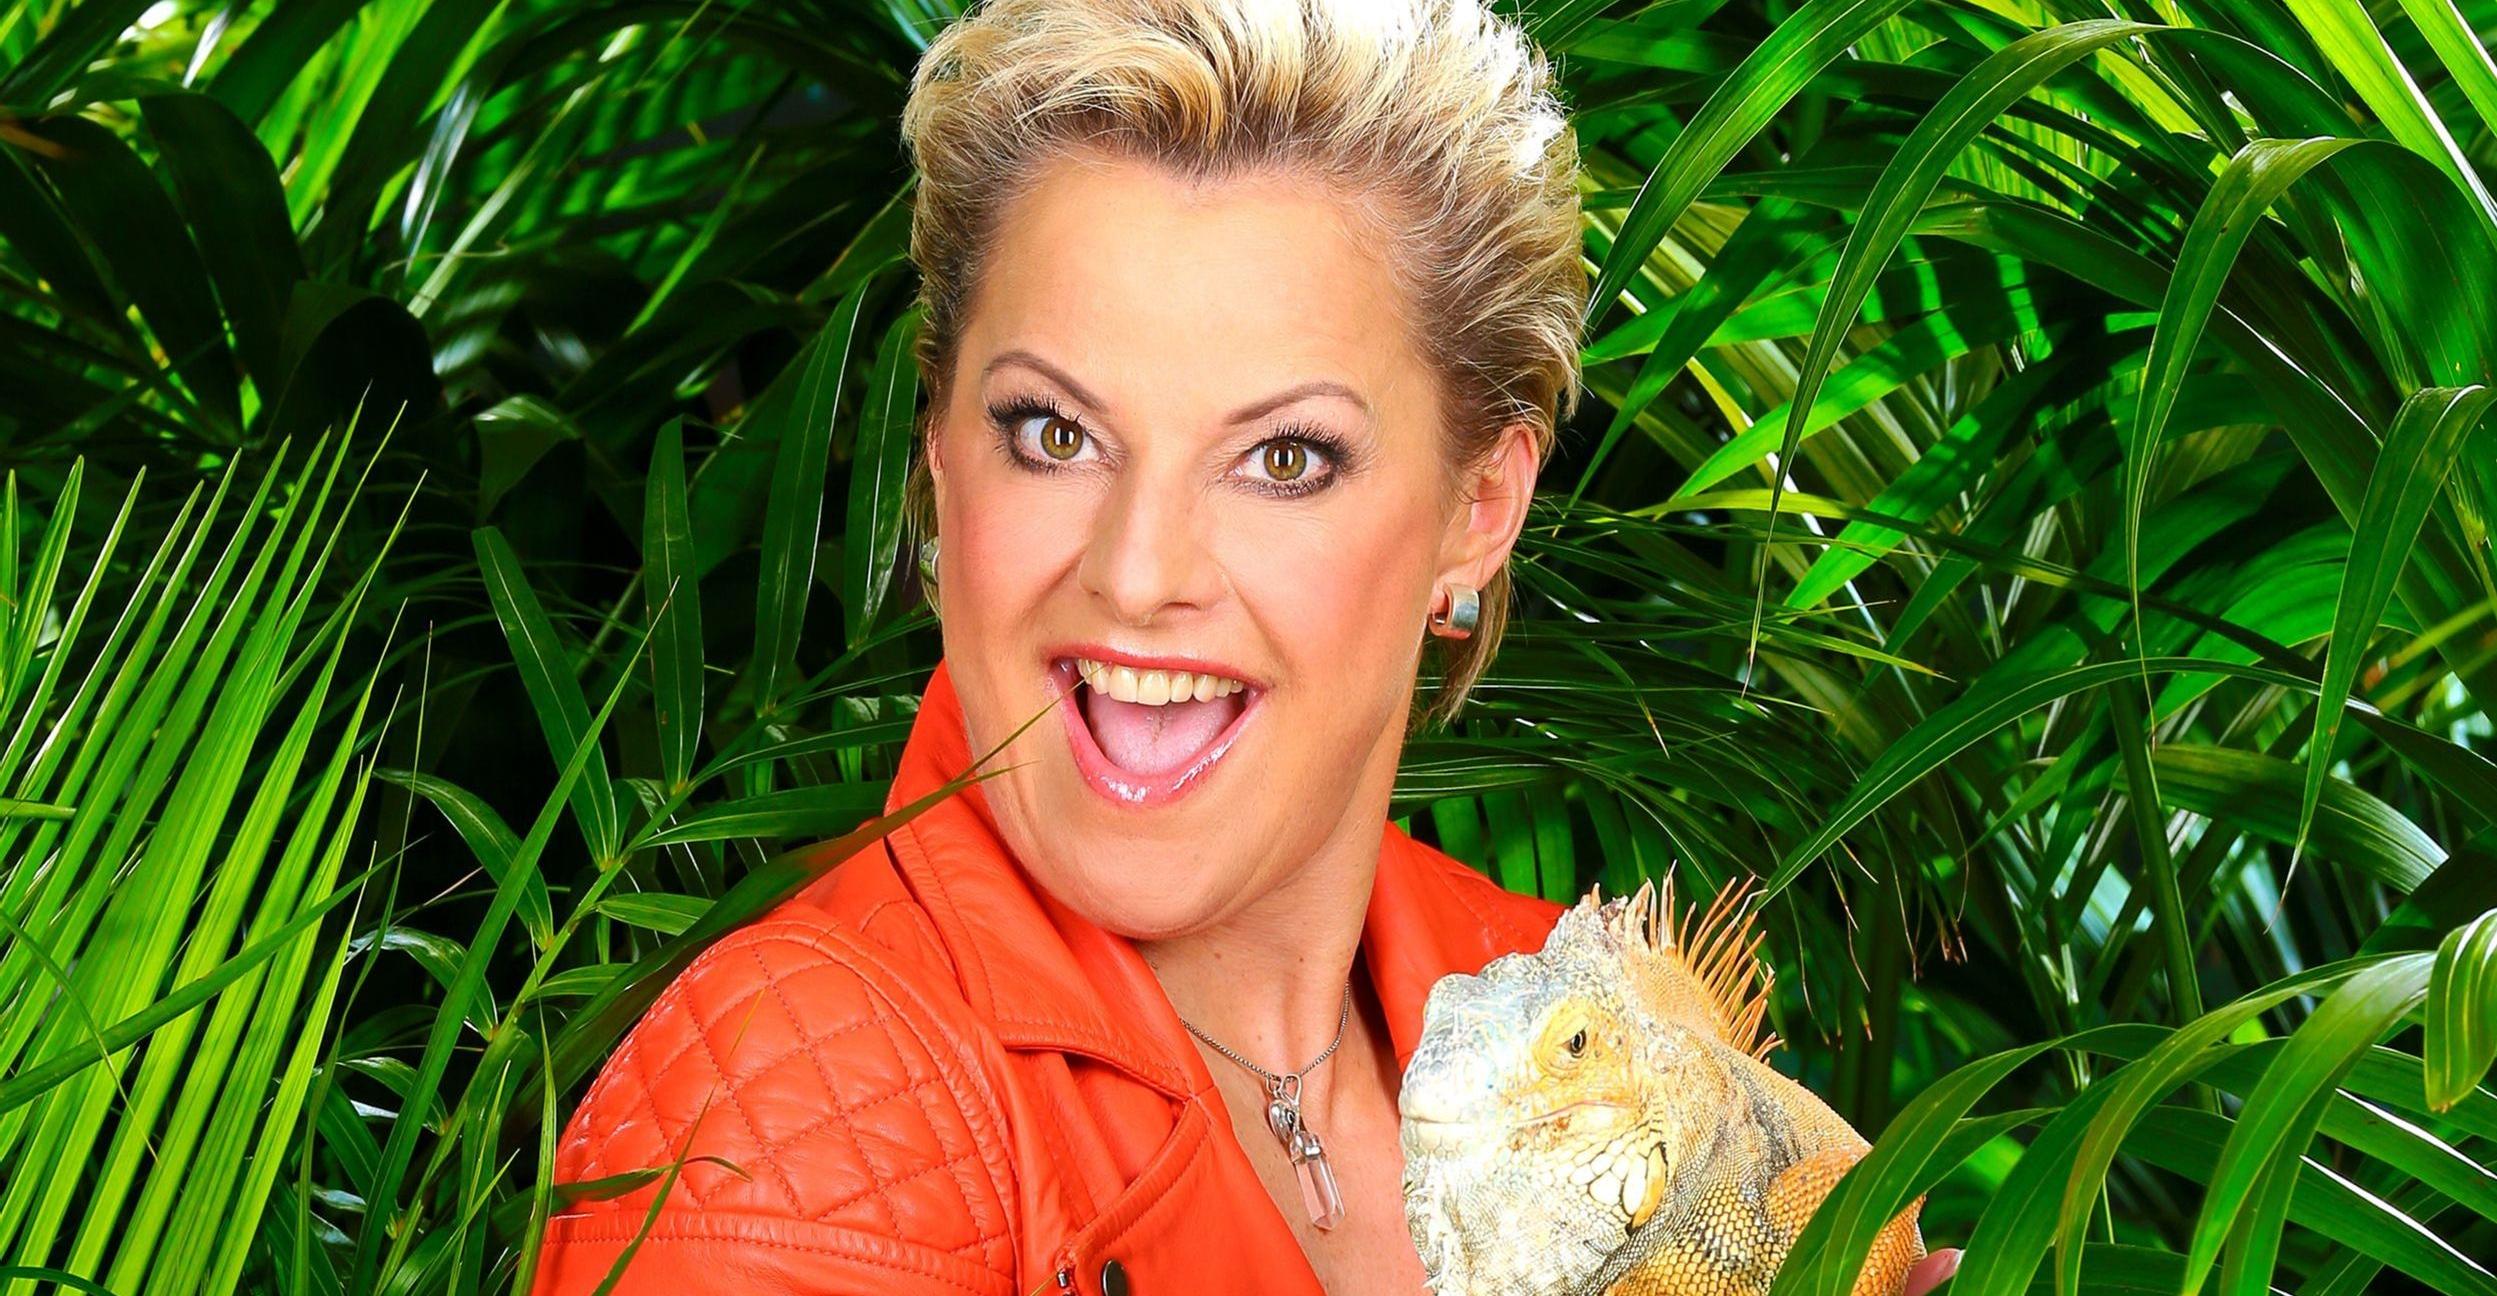 Tanja Schumann Dschungelcamp 2014 Kandidat2